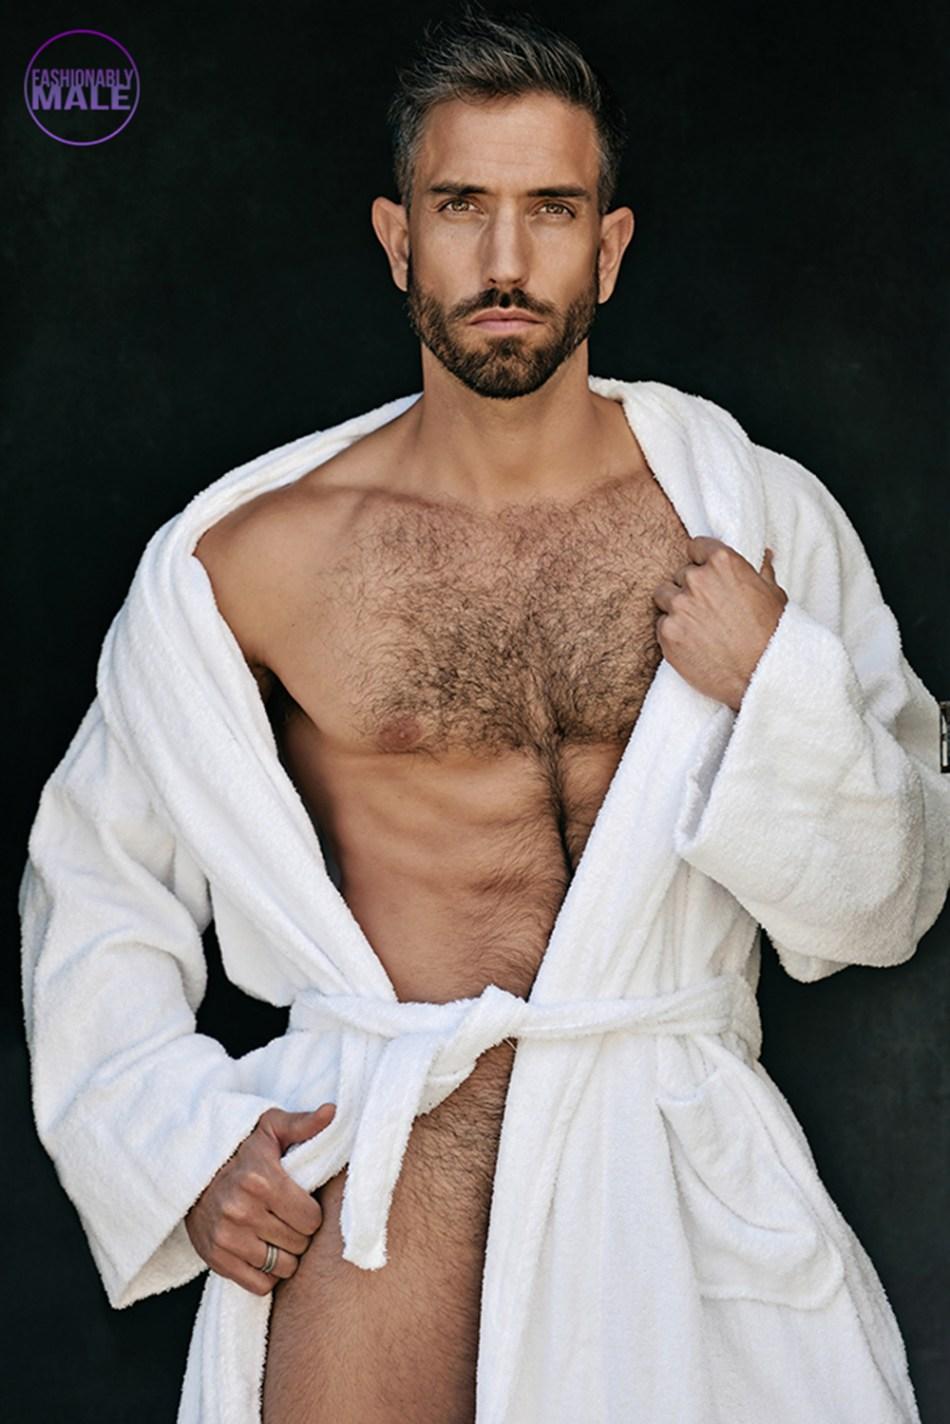 Stephane Marti by Shotsbygun for Fashionably Male7